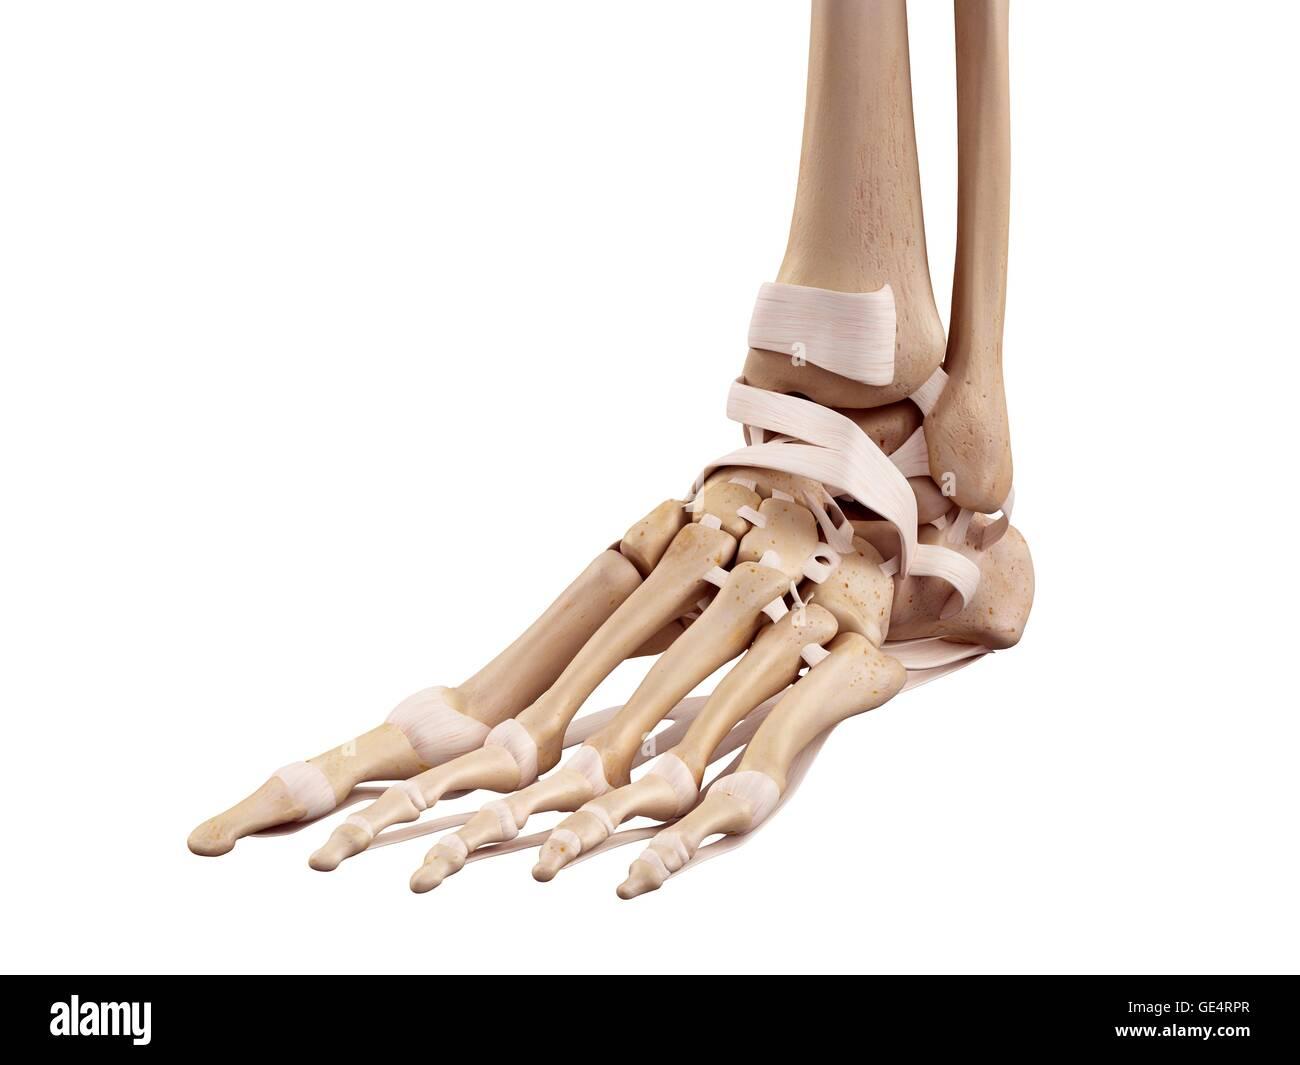 Ligaments Human Foot Illustration Stock Photos & Ligaments Human ...